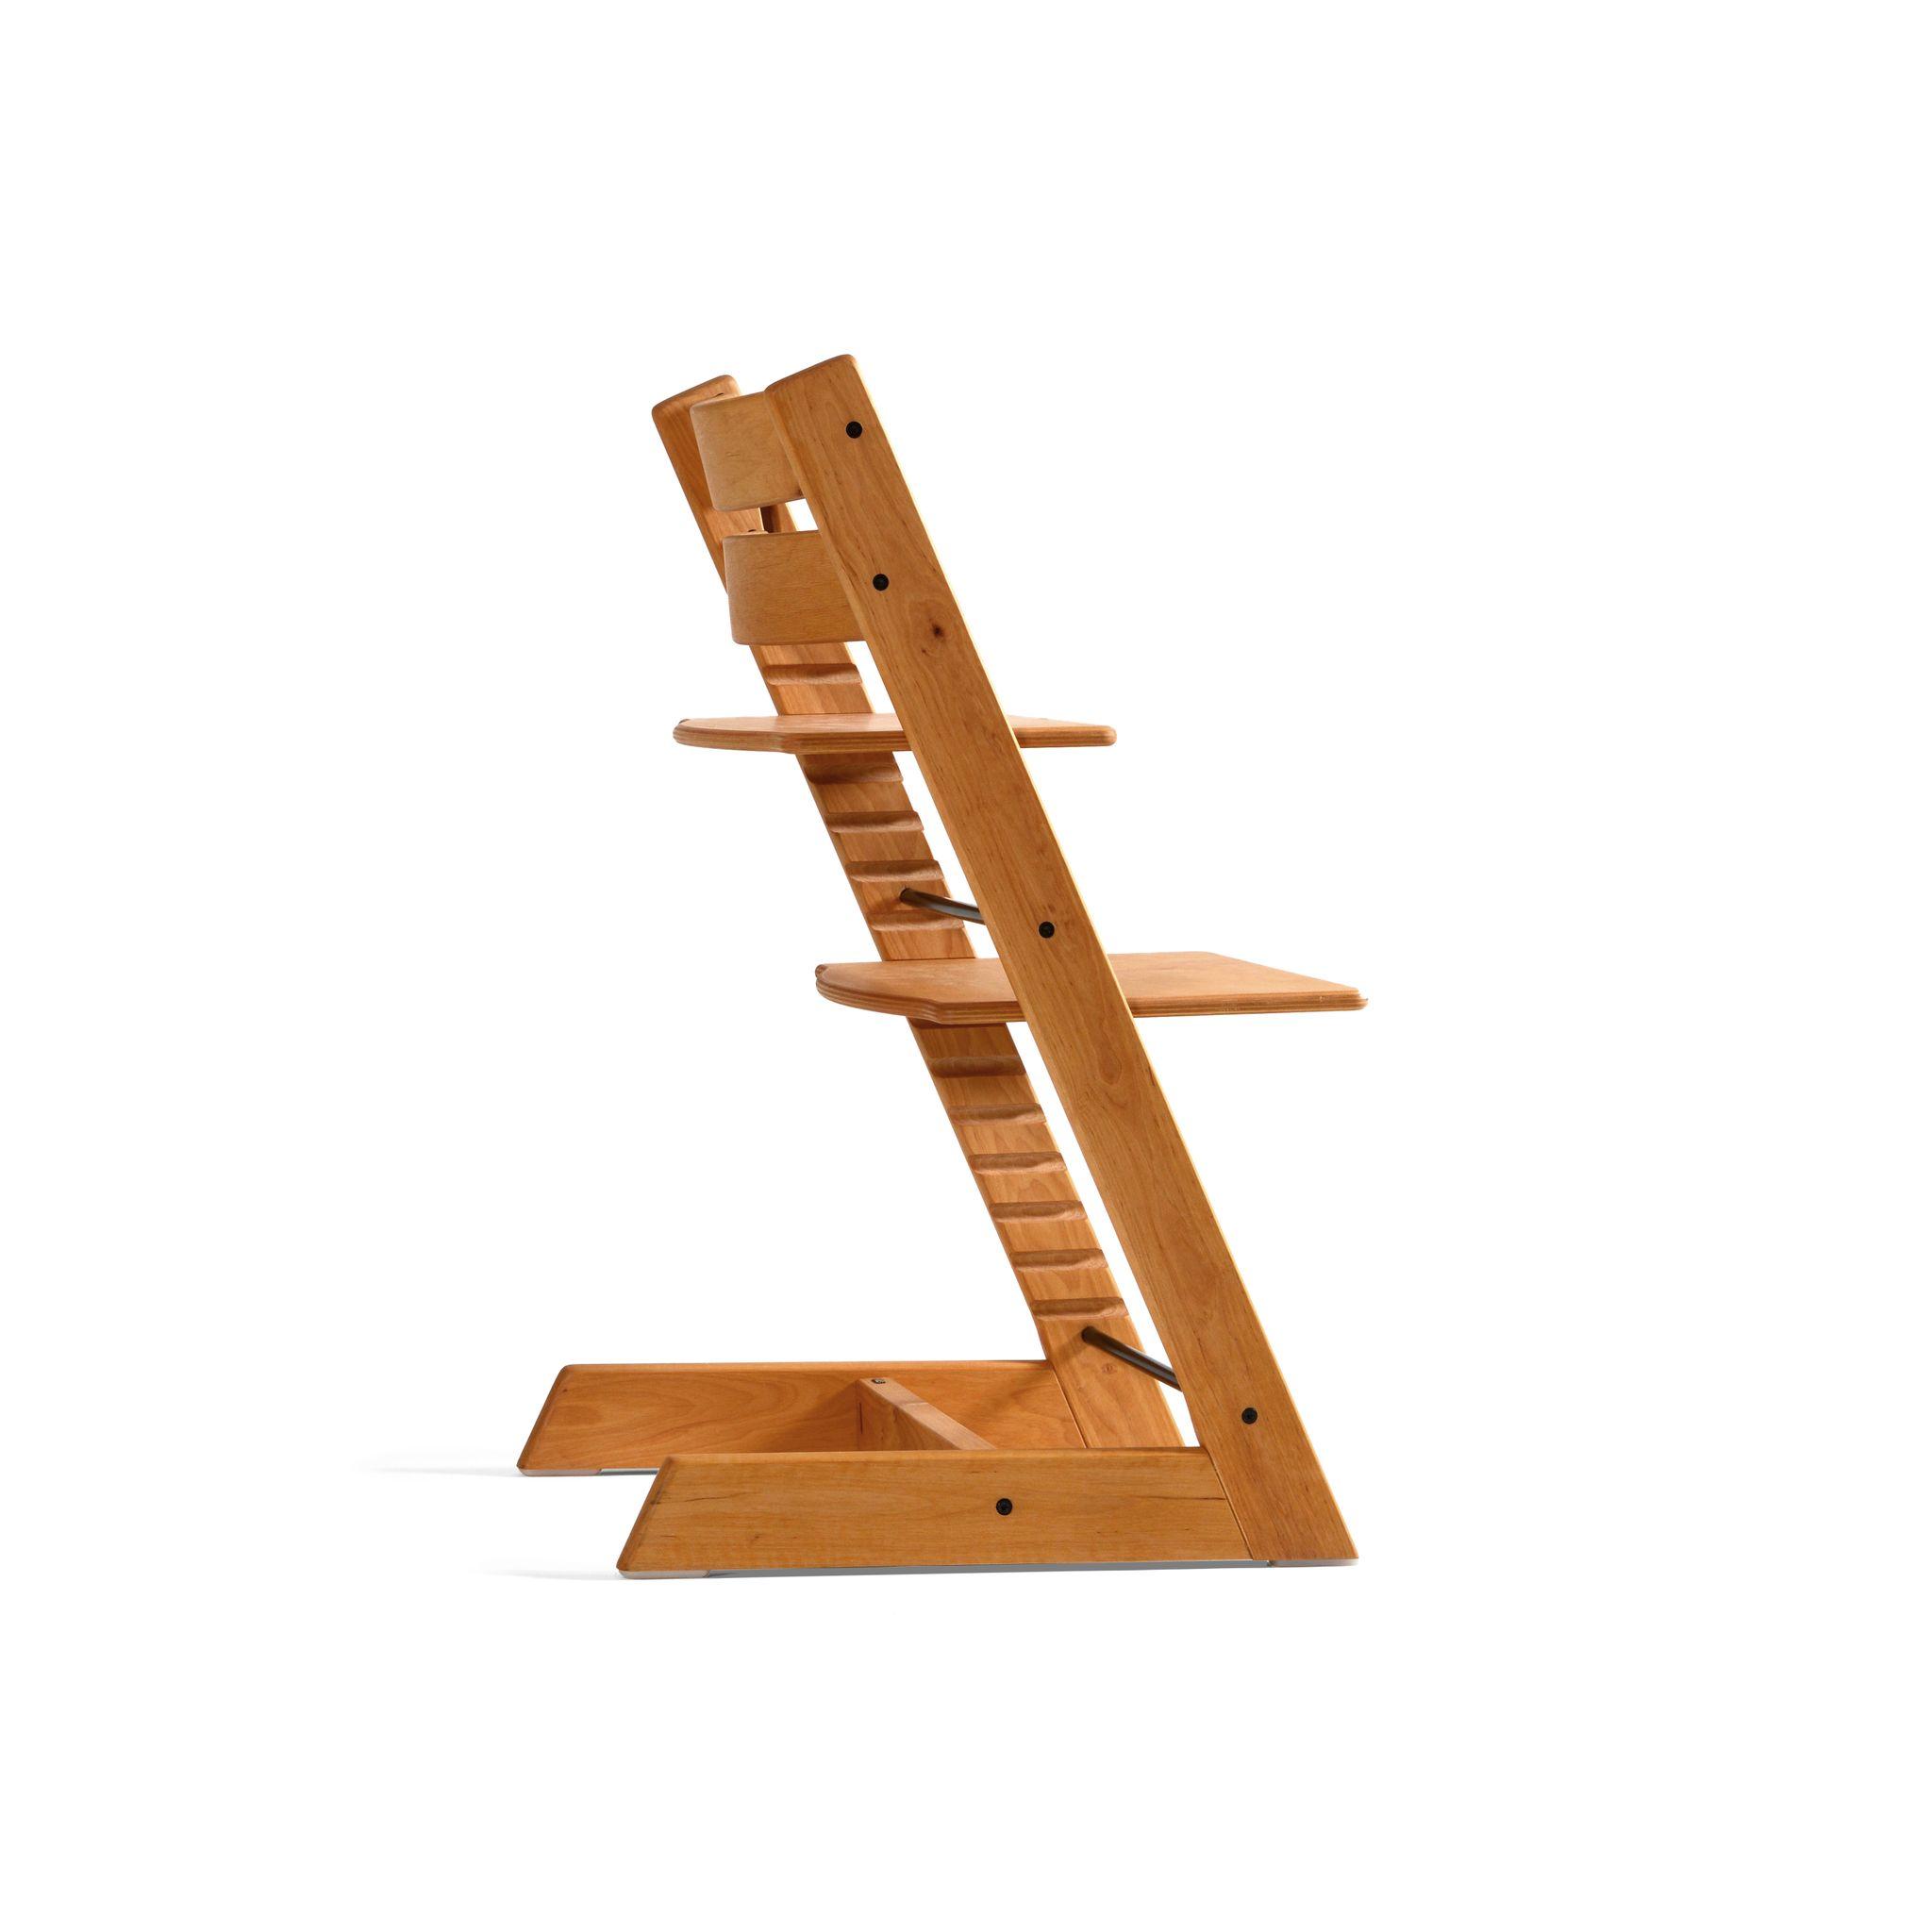 Annonse:Derfor er Tripp Trapp stolen formet som en trapp